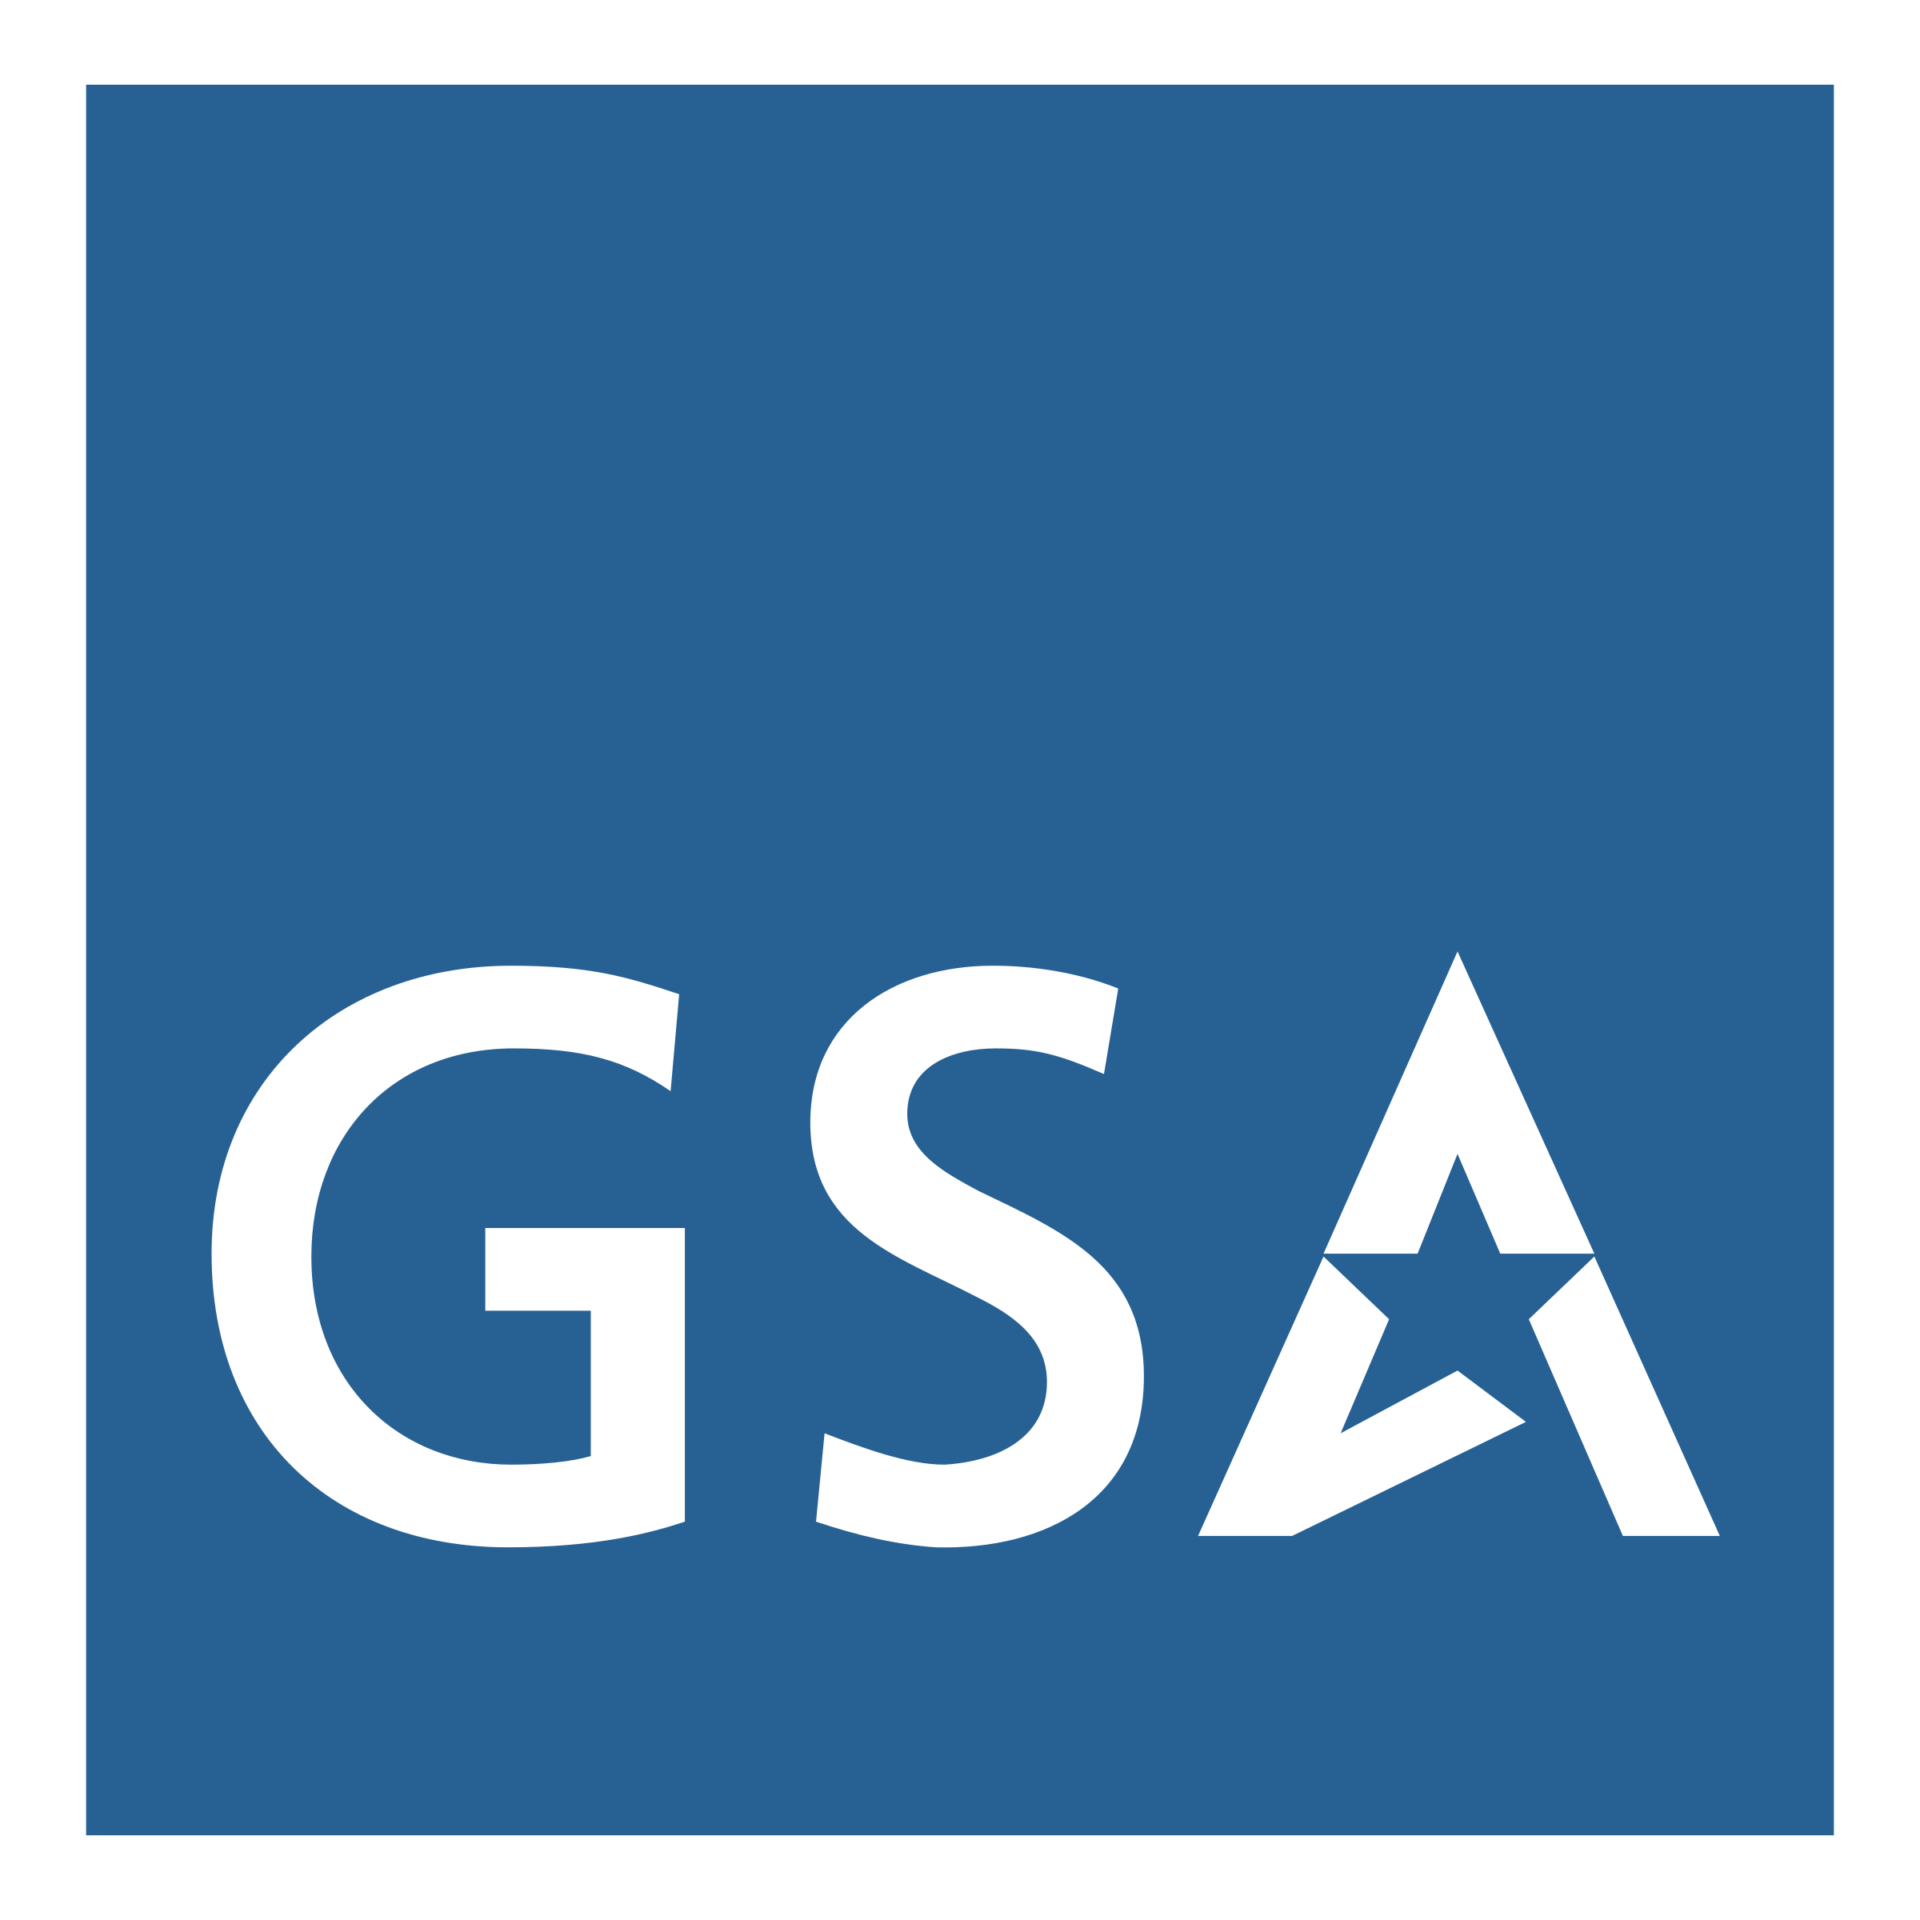 gsa-logo-png-transparent - Cambridge